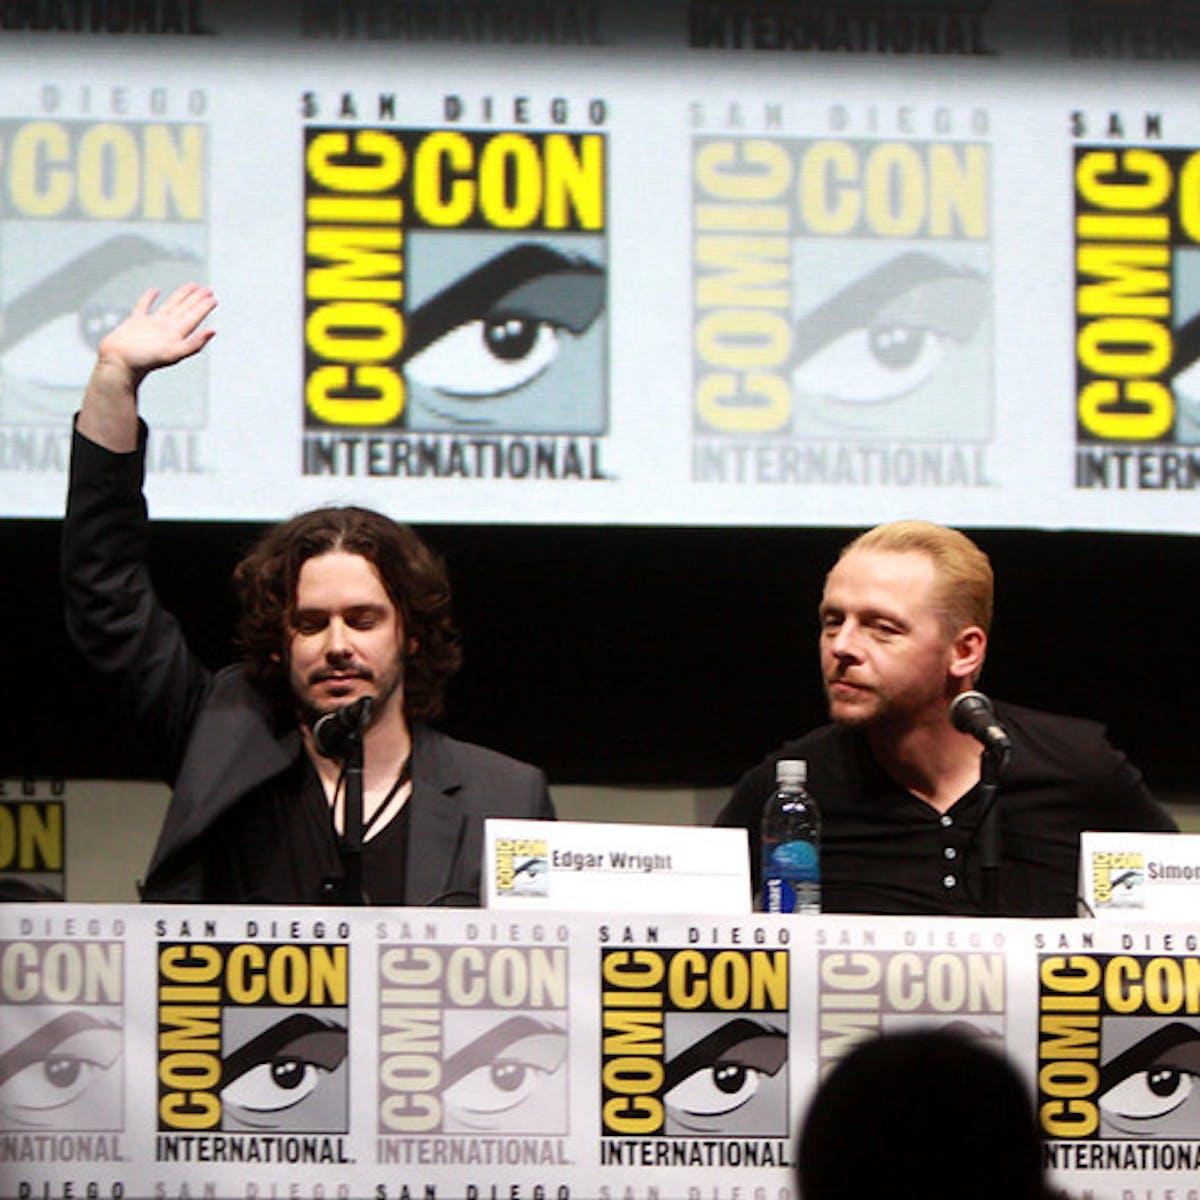 "'Last Night in Soho' isn't a Cornetto movie, it's a ""whole new series"""